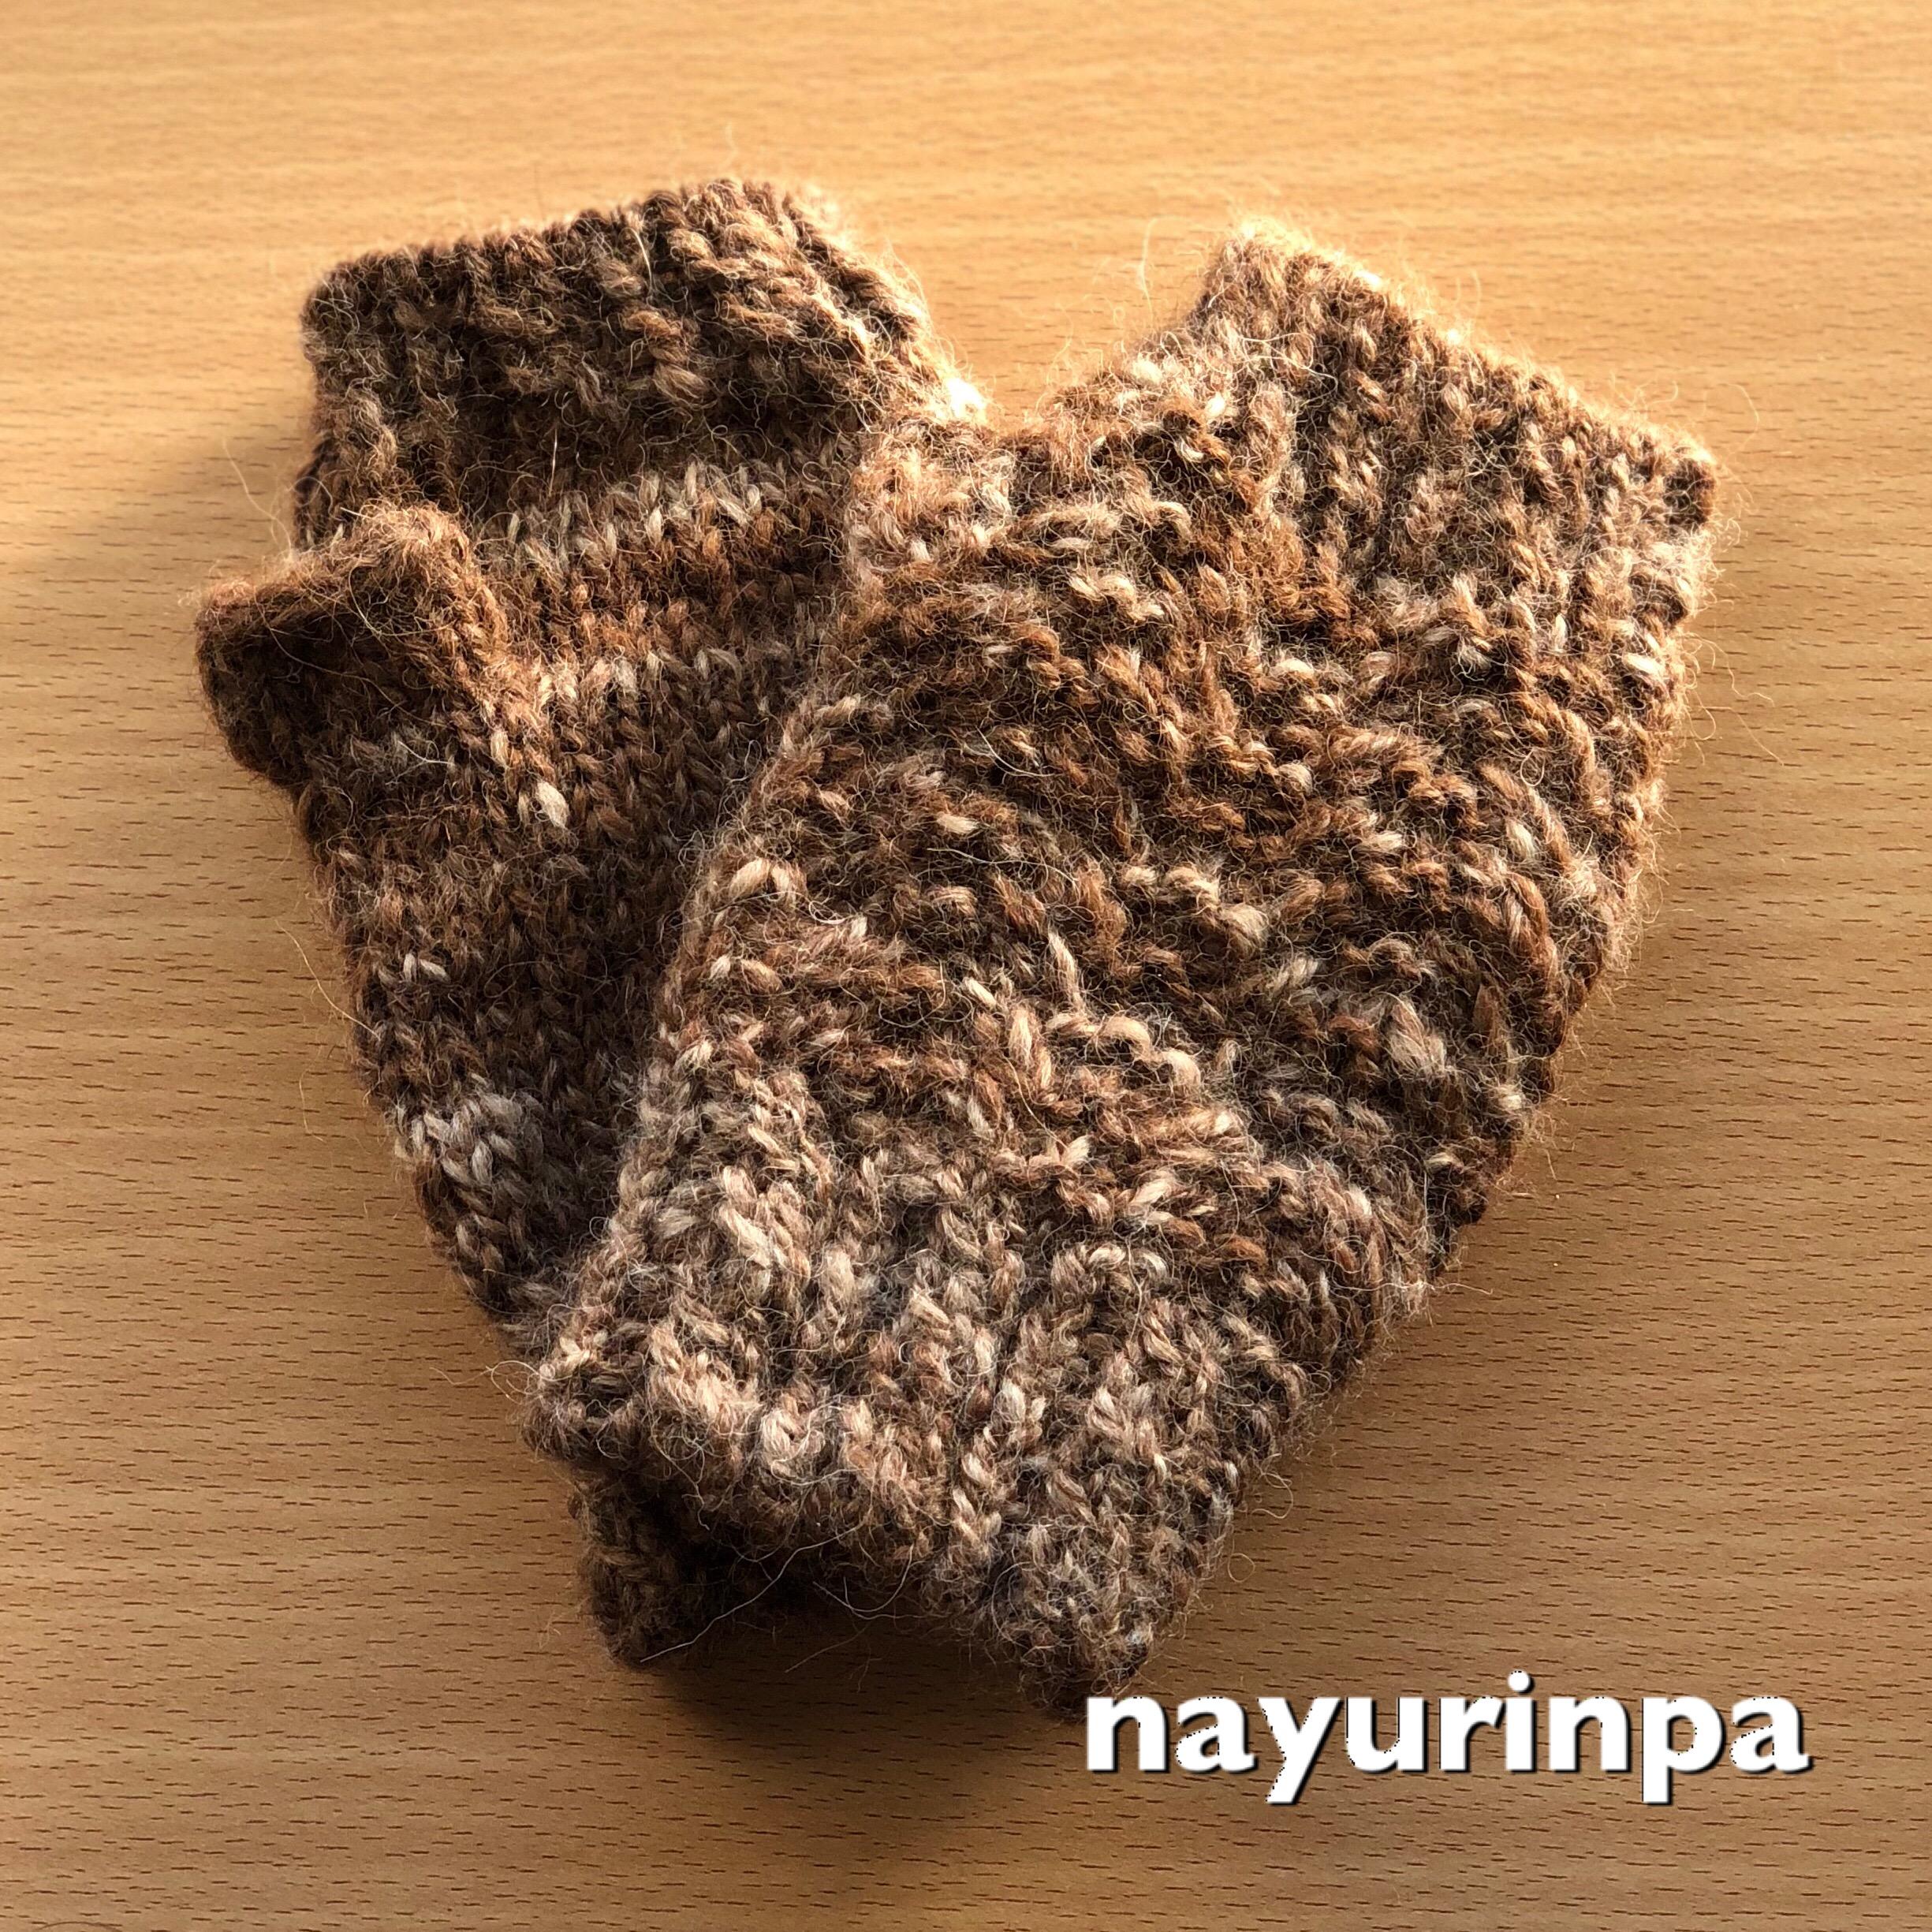 nayu4